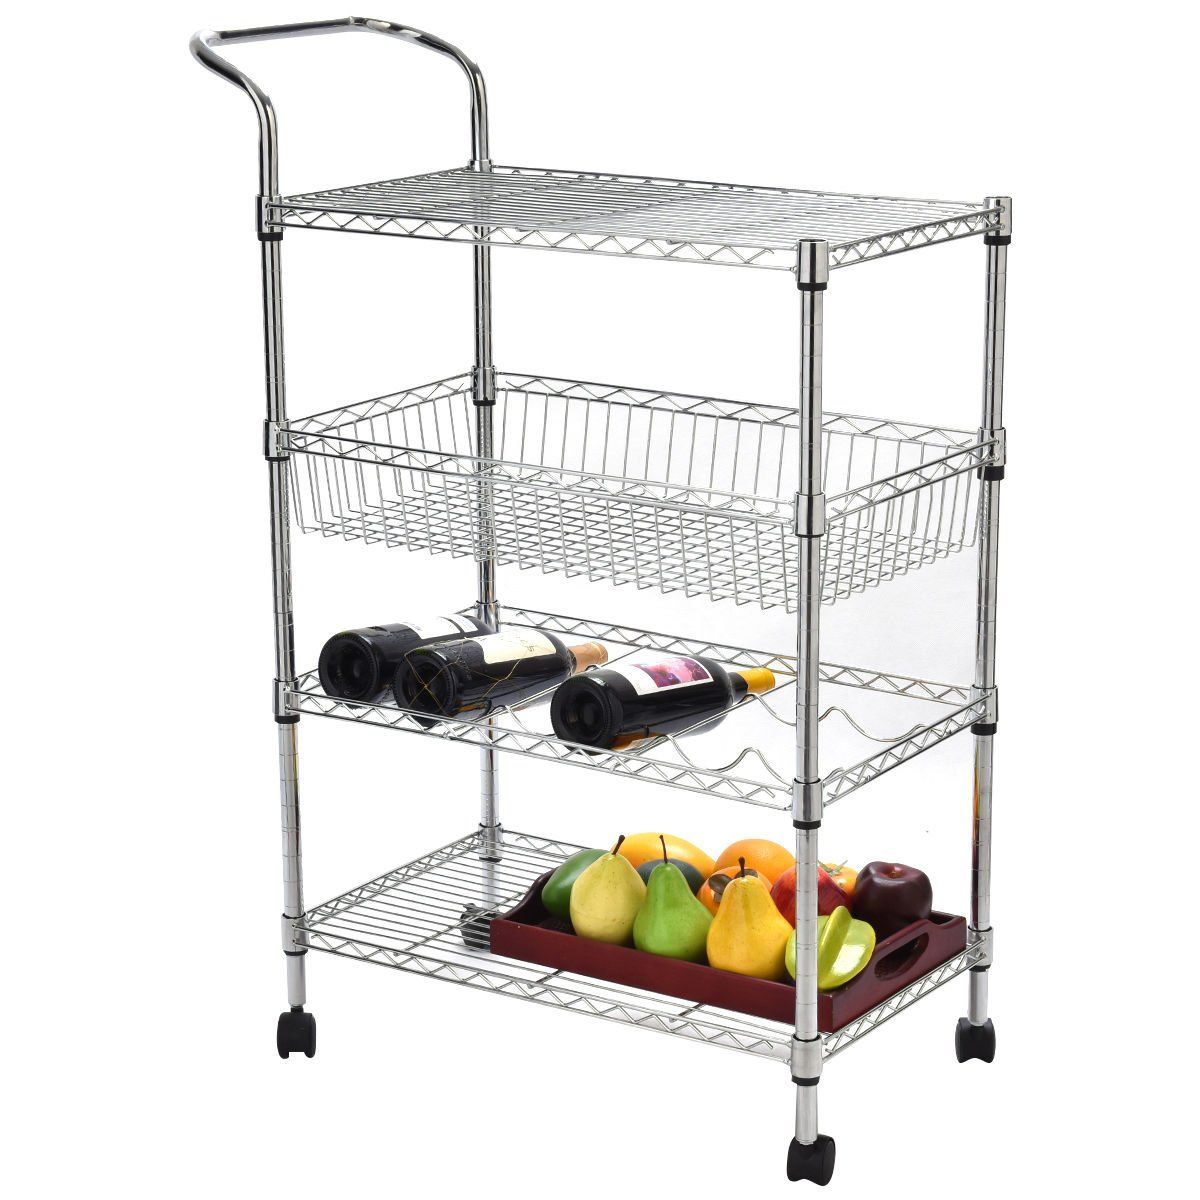 lunanice 4 -Tier Steel Rolling Kitchen Trolley Cart Island Wire Rack Basket Shelf Stand Shelf Height Is Adjustable